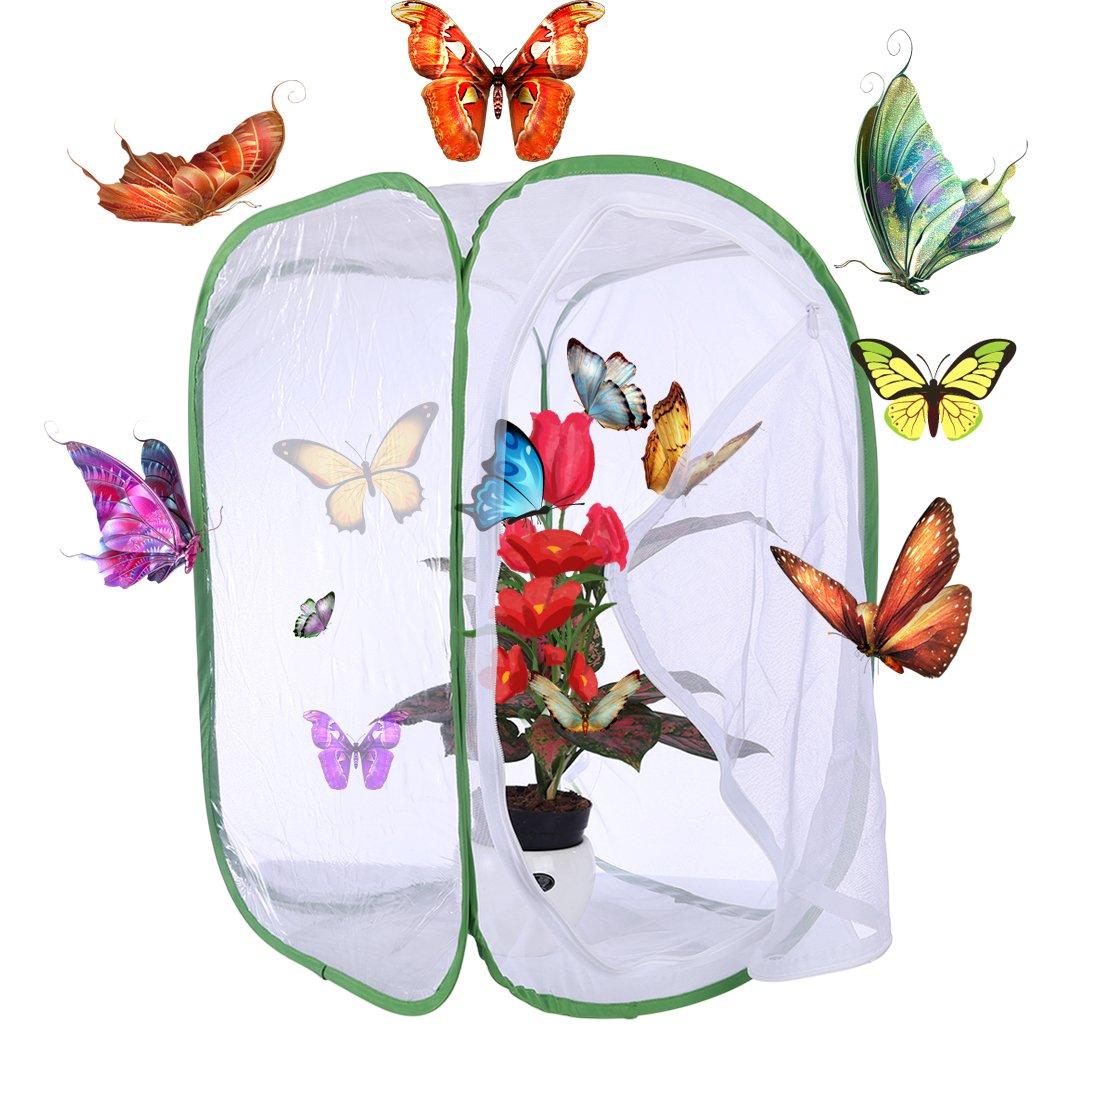 UOPJKL Gabbia a farfalla Habitat Cage Bug Butterfly Village habitat kit Apparire 60cm